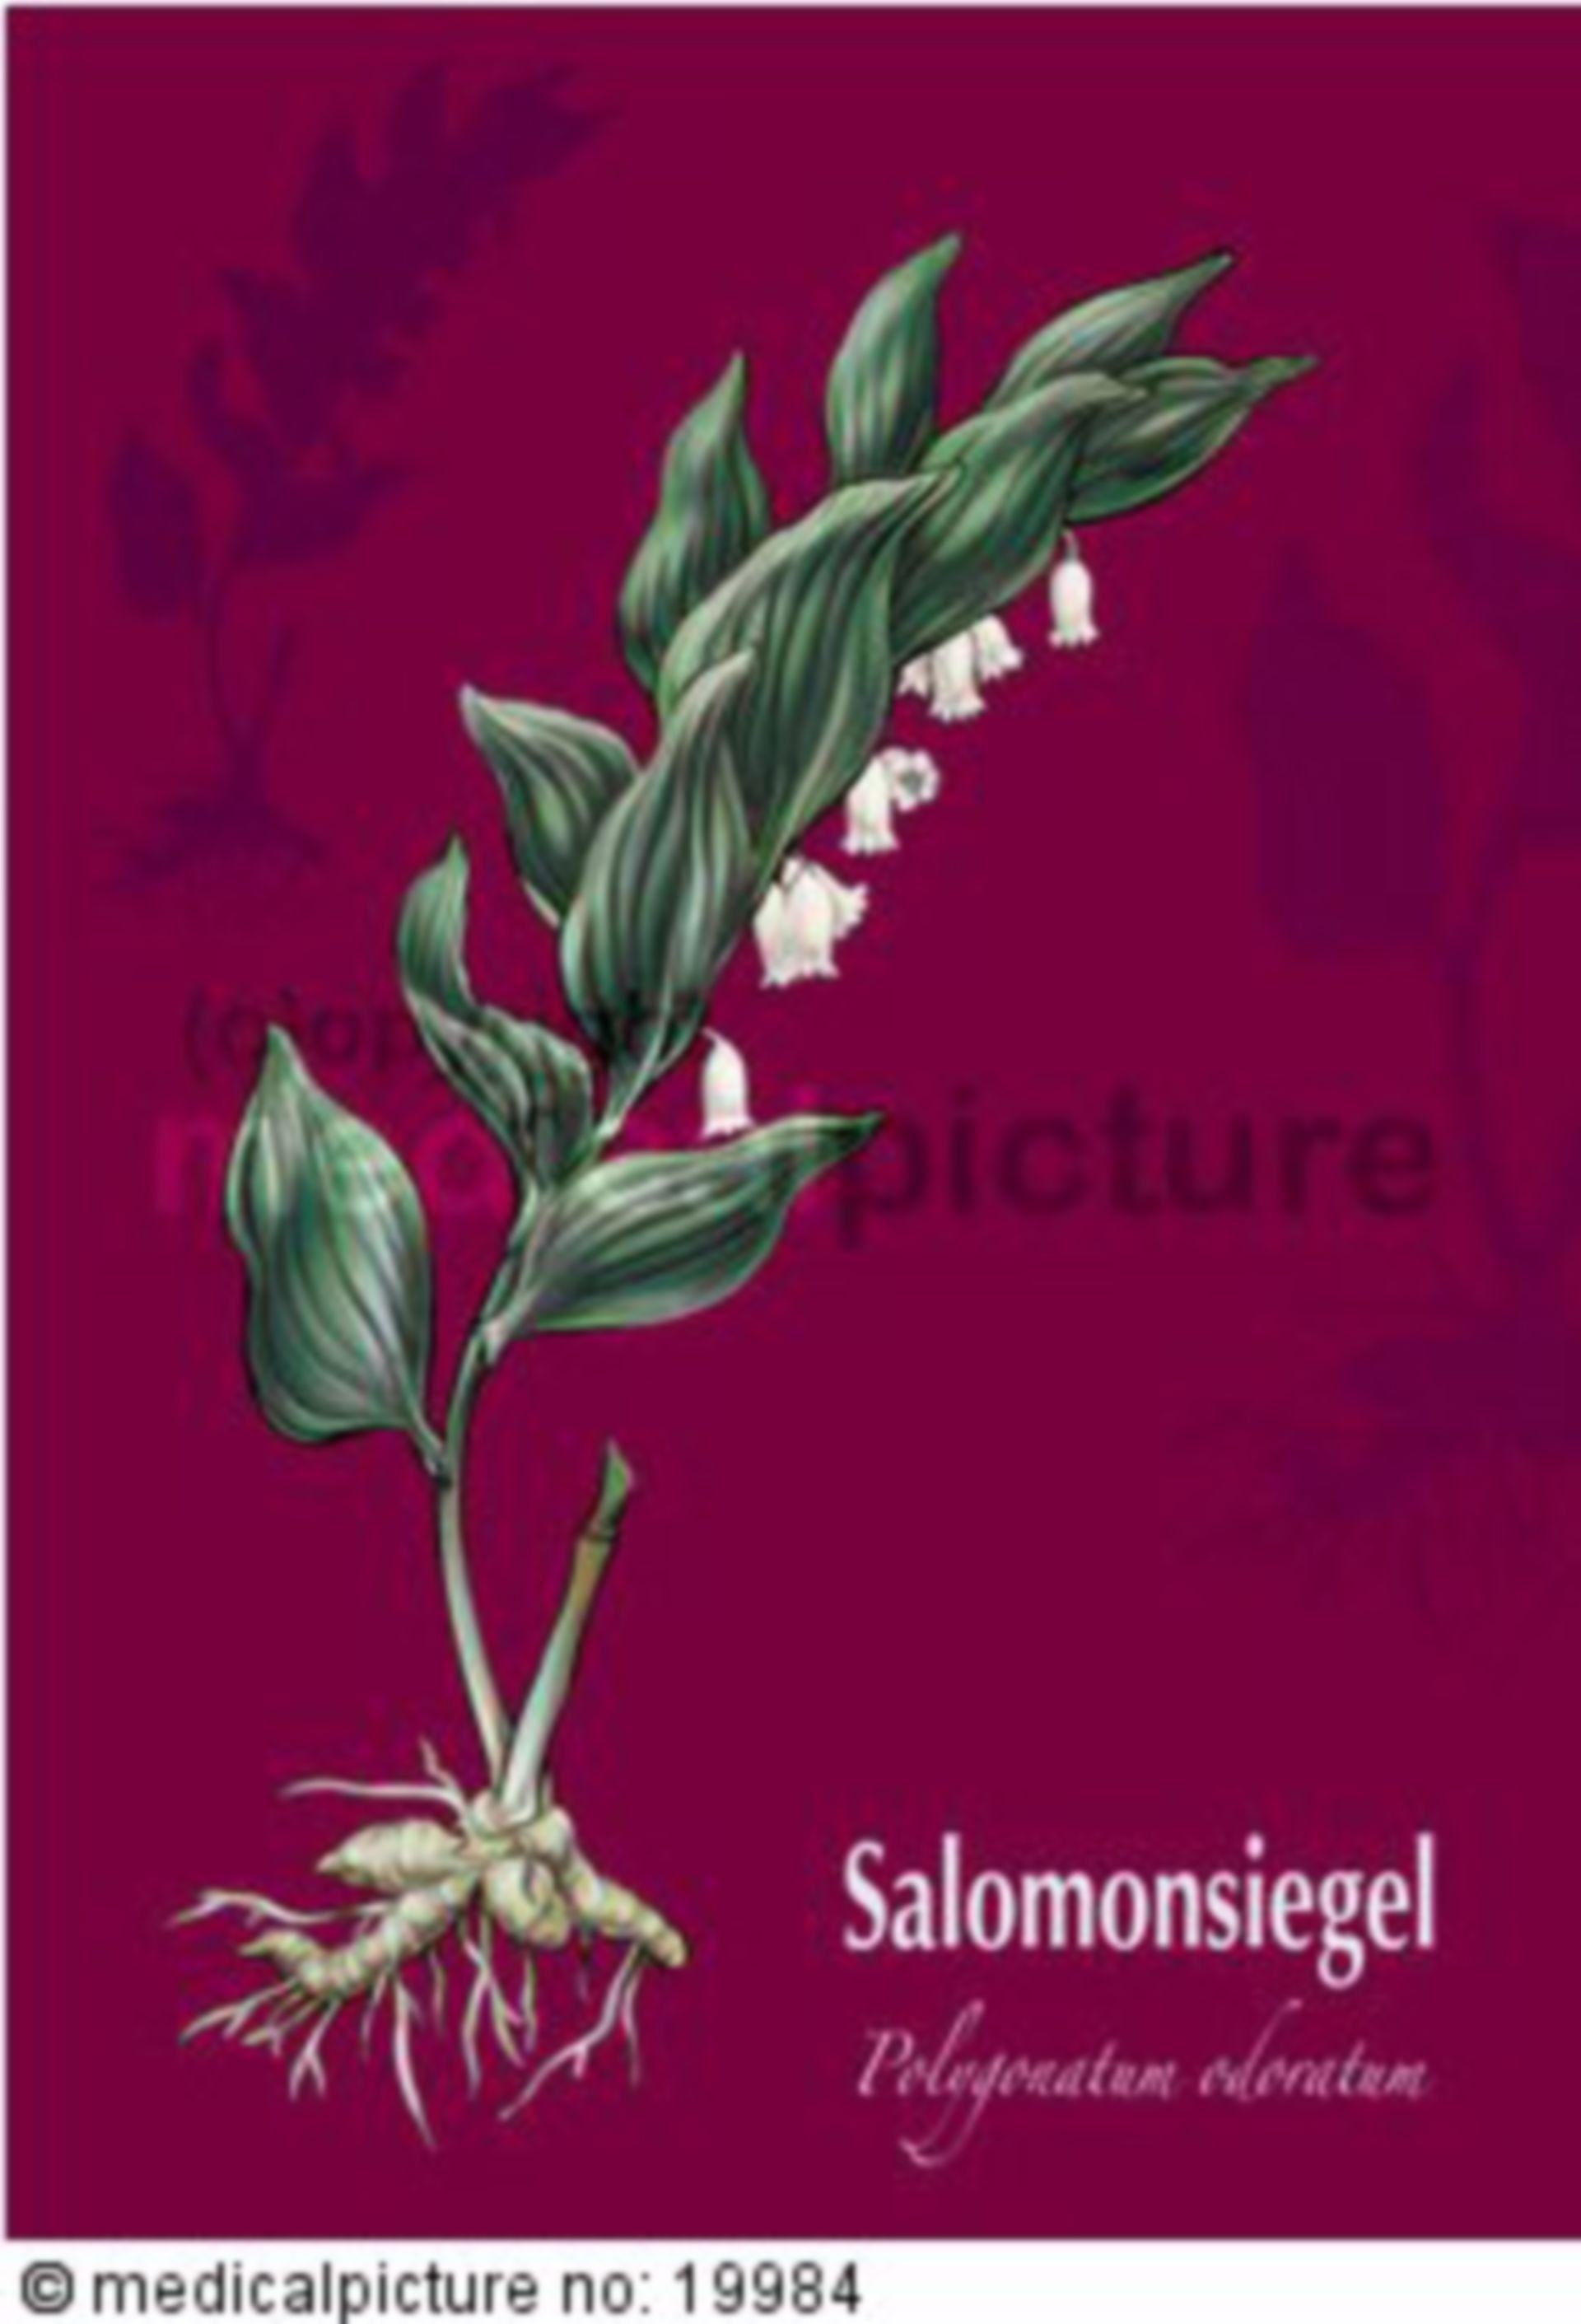 Salomonsiegel, Polygonatum odoratum